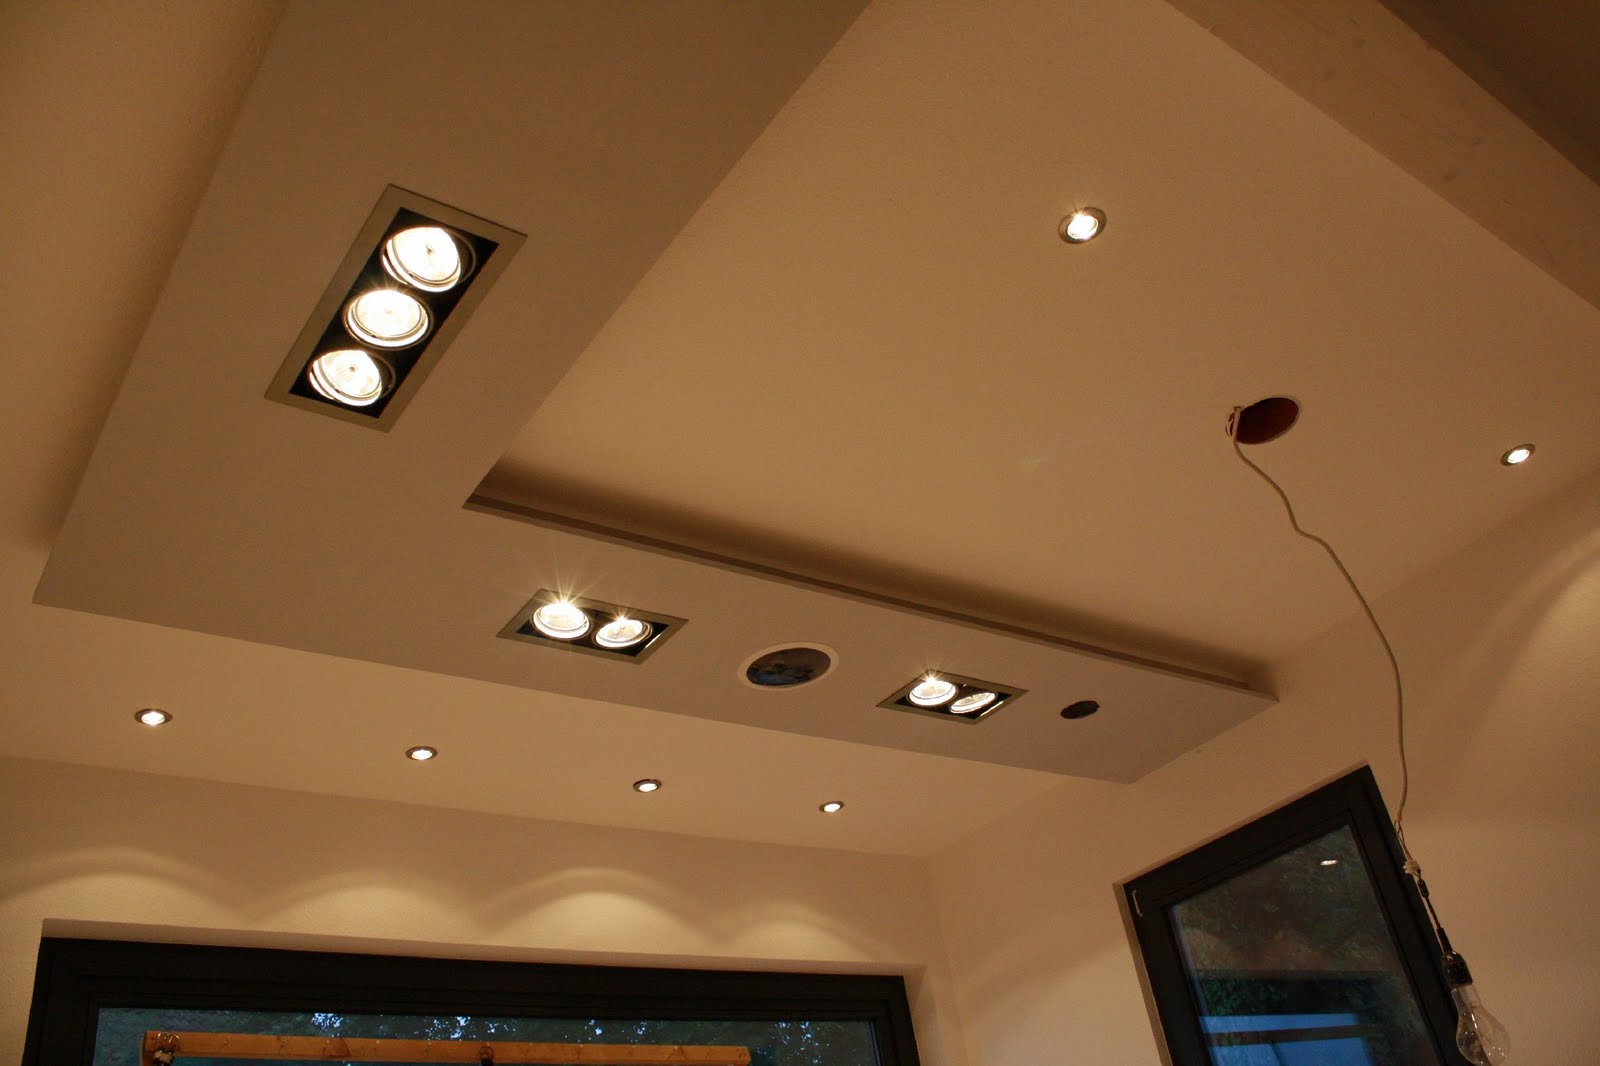 Wohnzimmer Lampen  Jtleigh.com - Hausgestaltung Ideen